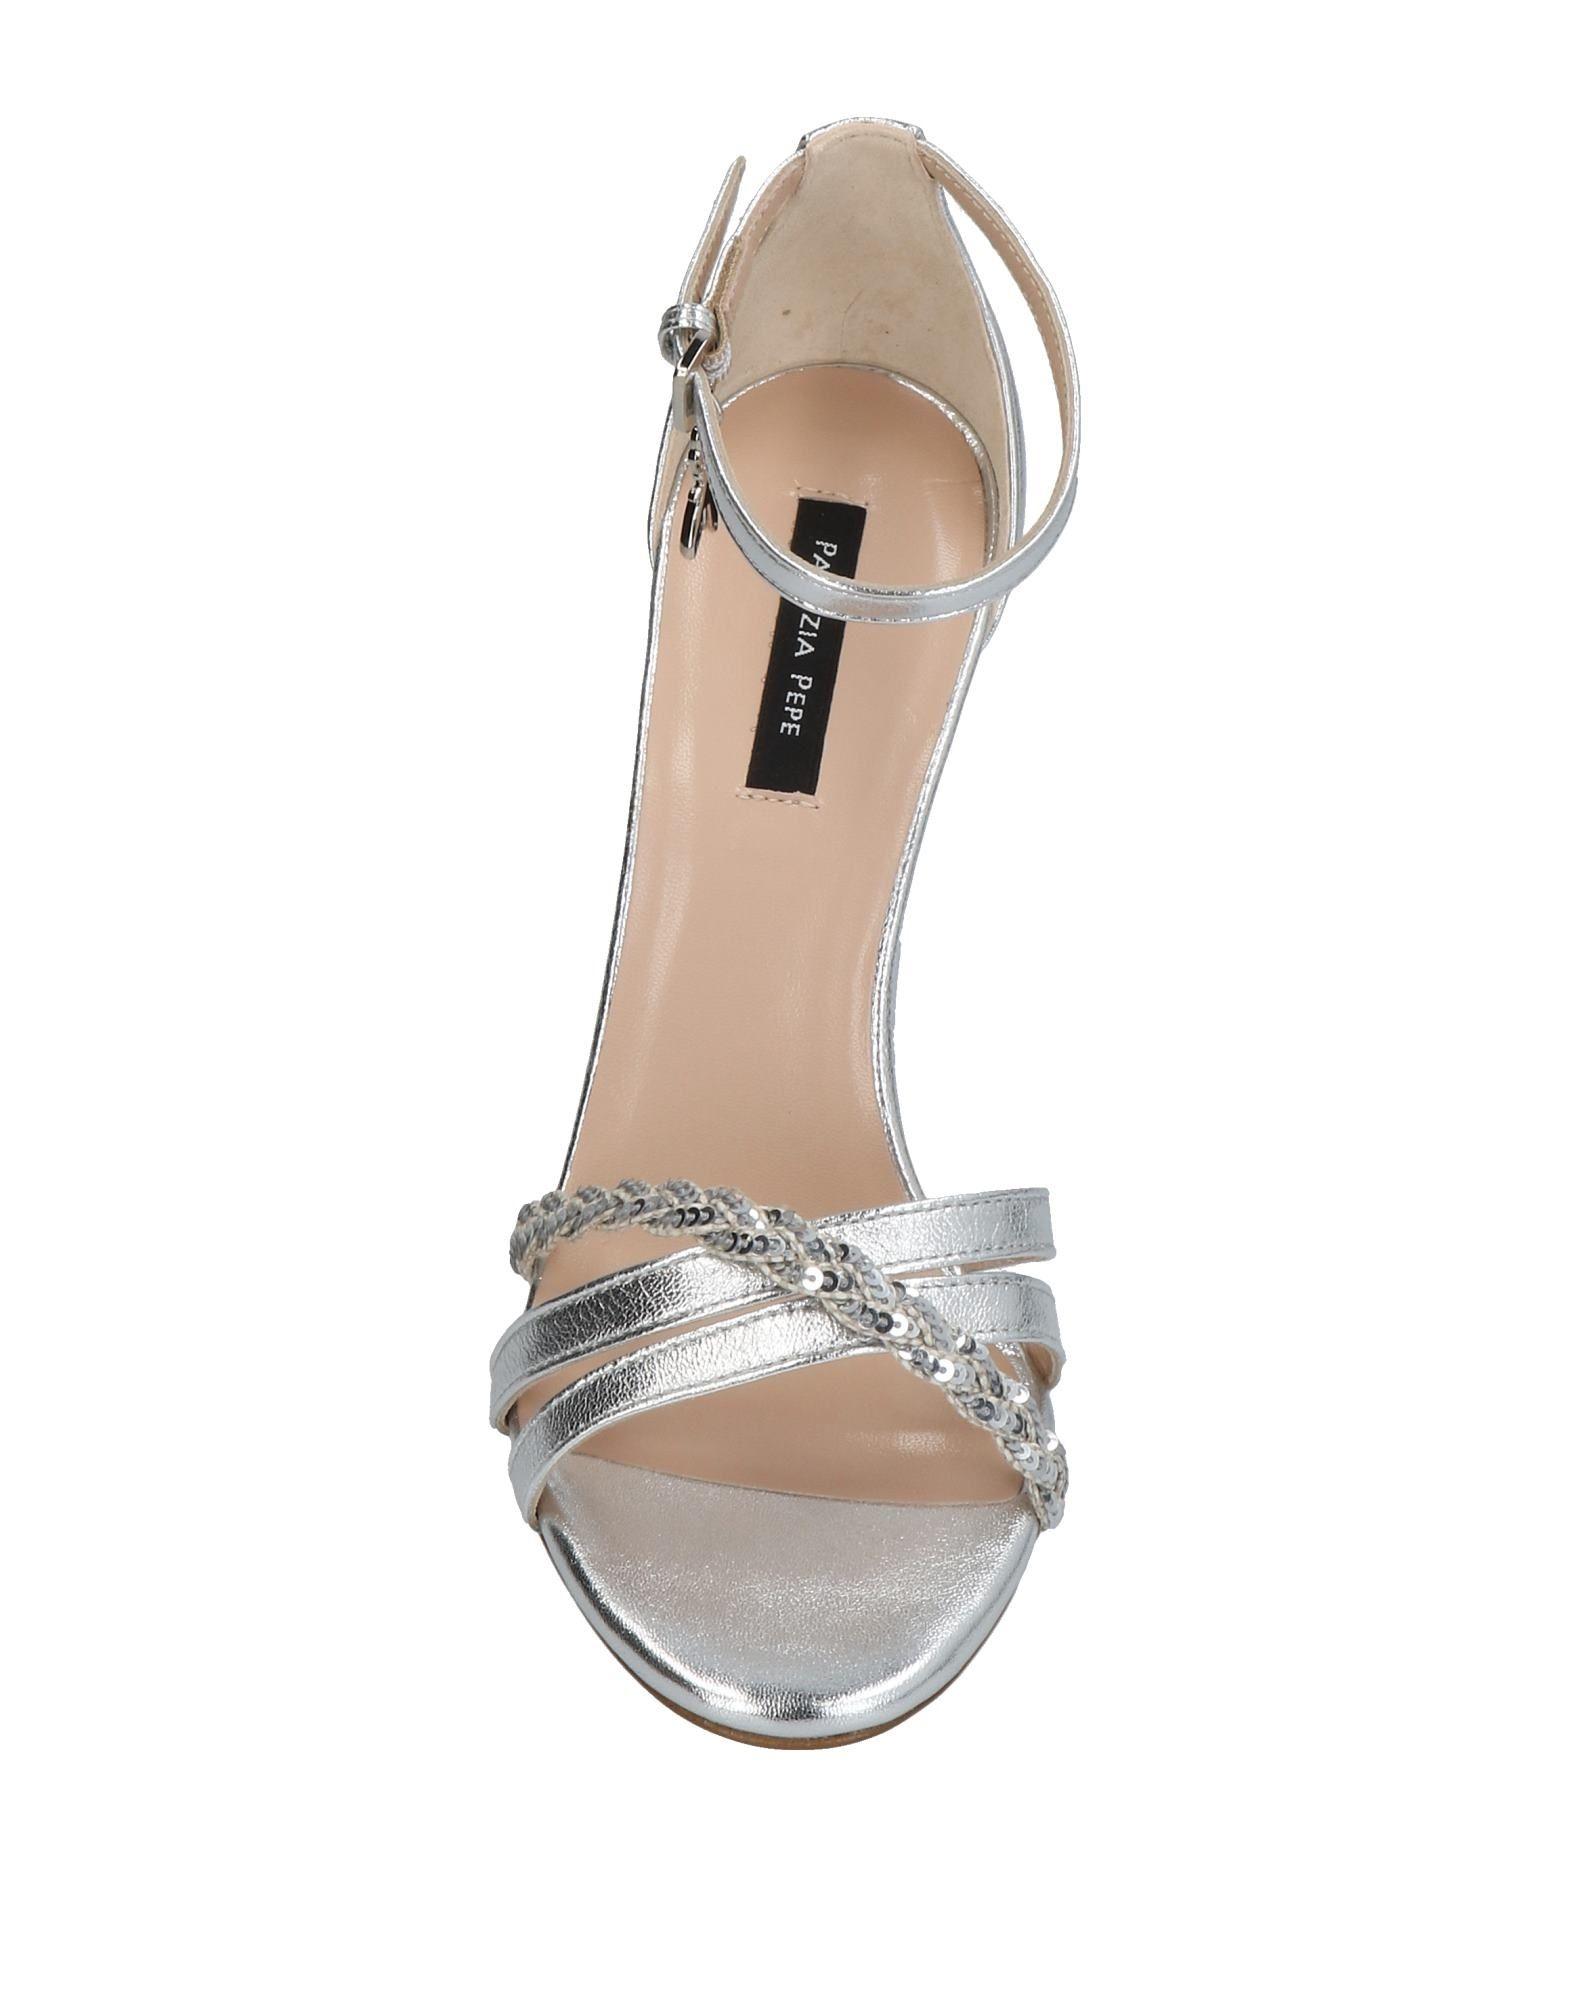 Patrizia Pepe Sandalen Damen beliebte 11436044CU Gute Qualität beliebte Damen Schuhe 7ff216